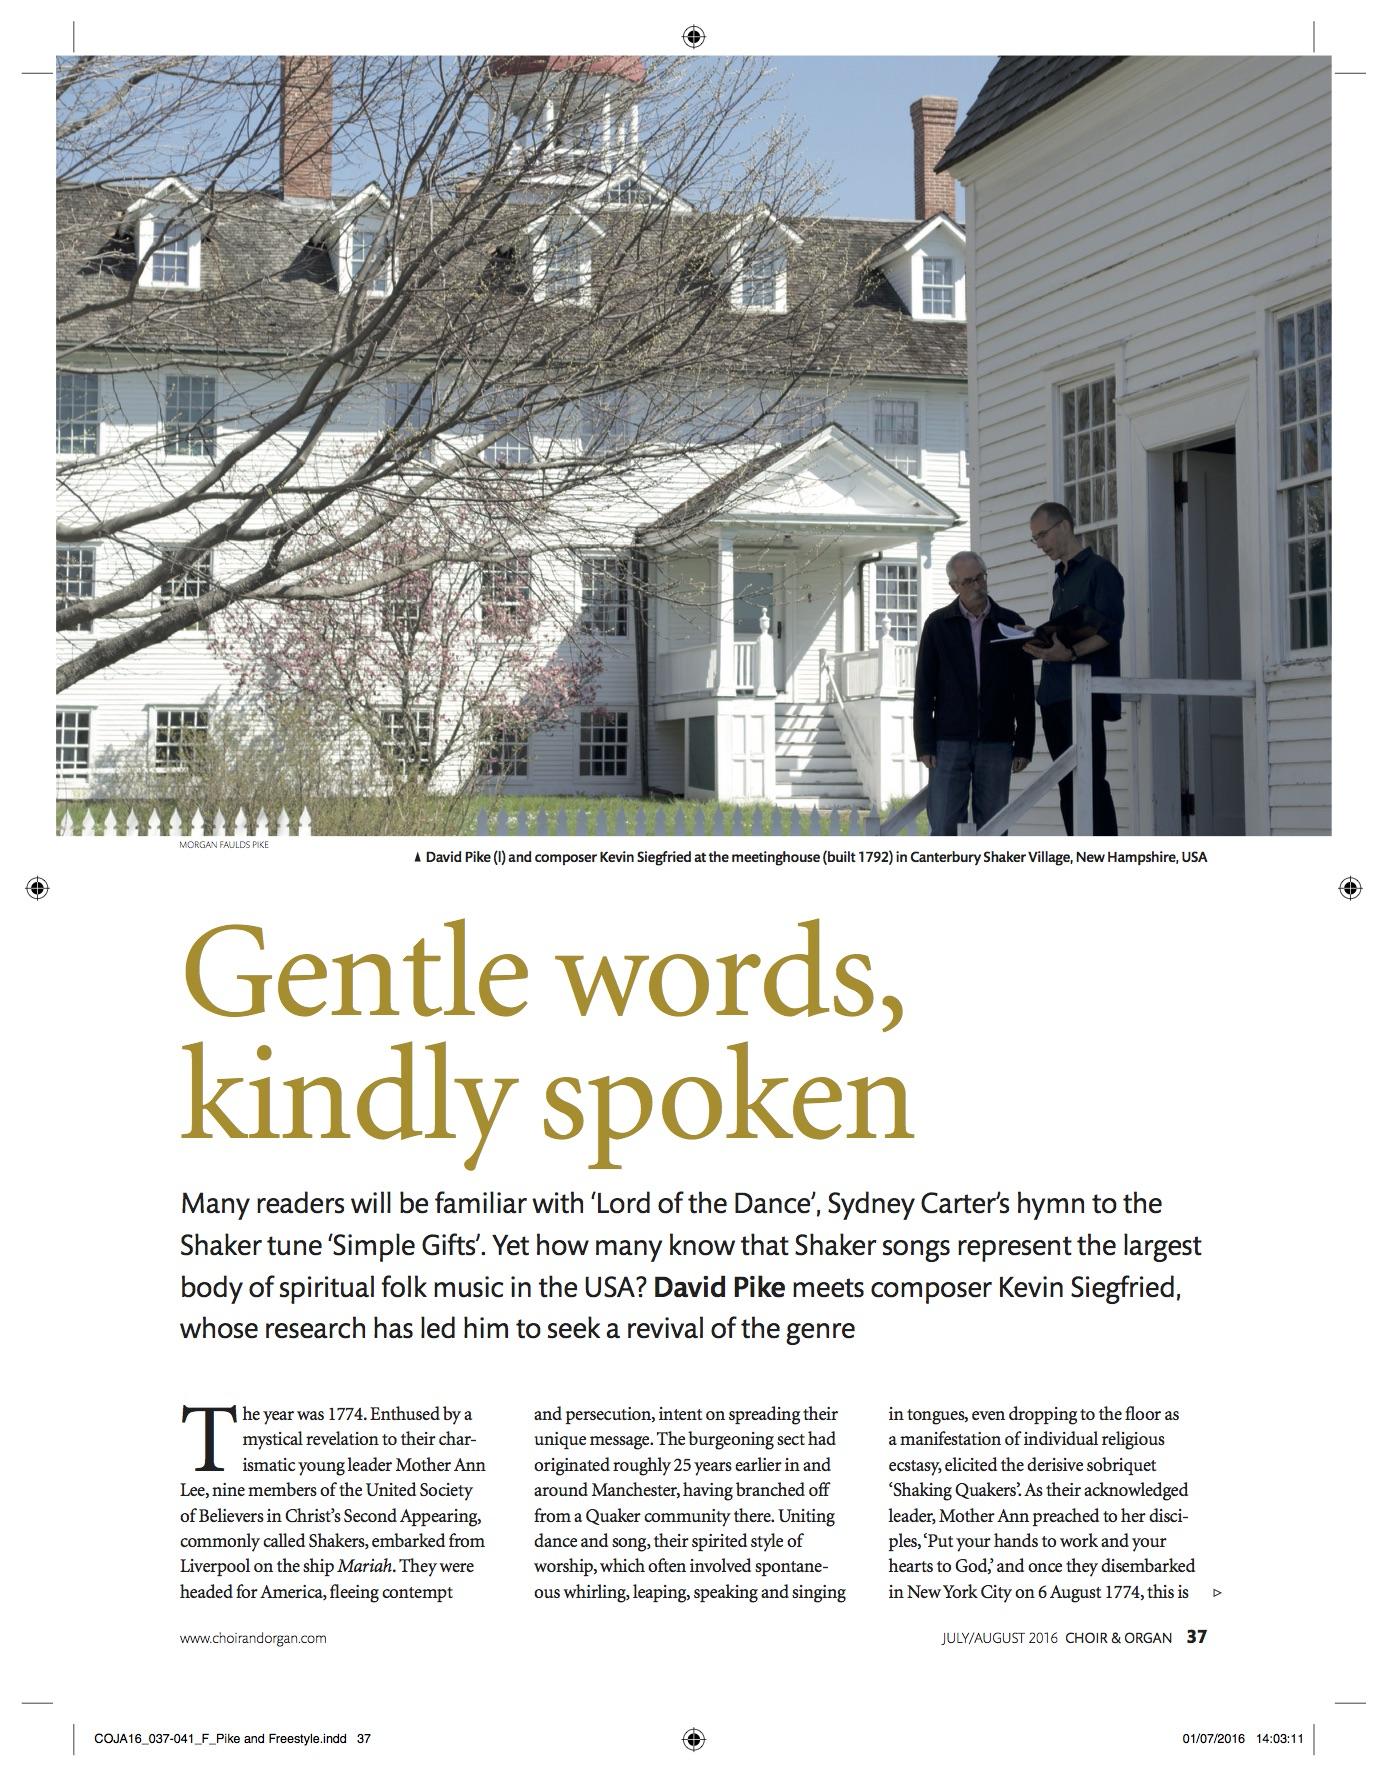 Gentle Words, Kindly Spoken image.jpg